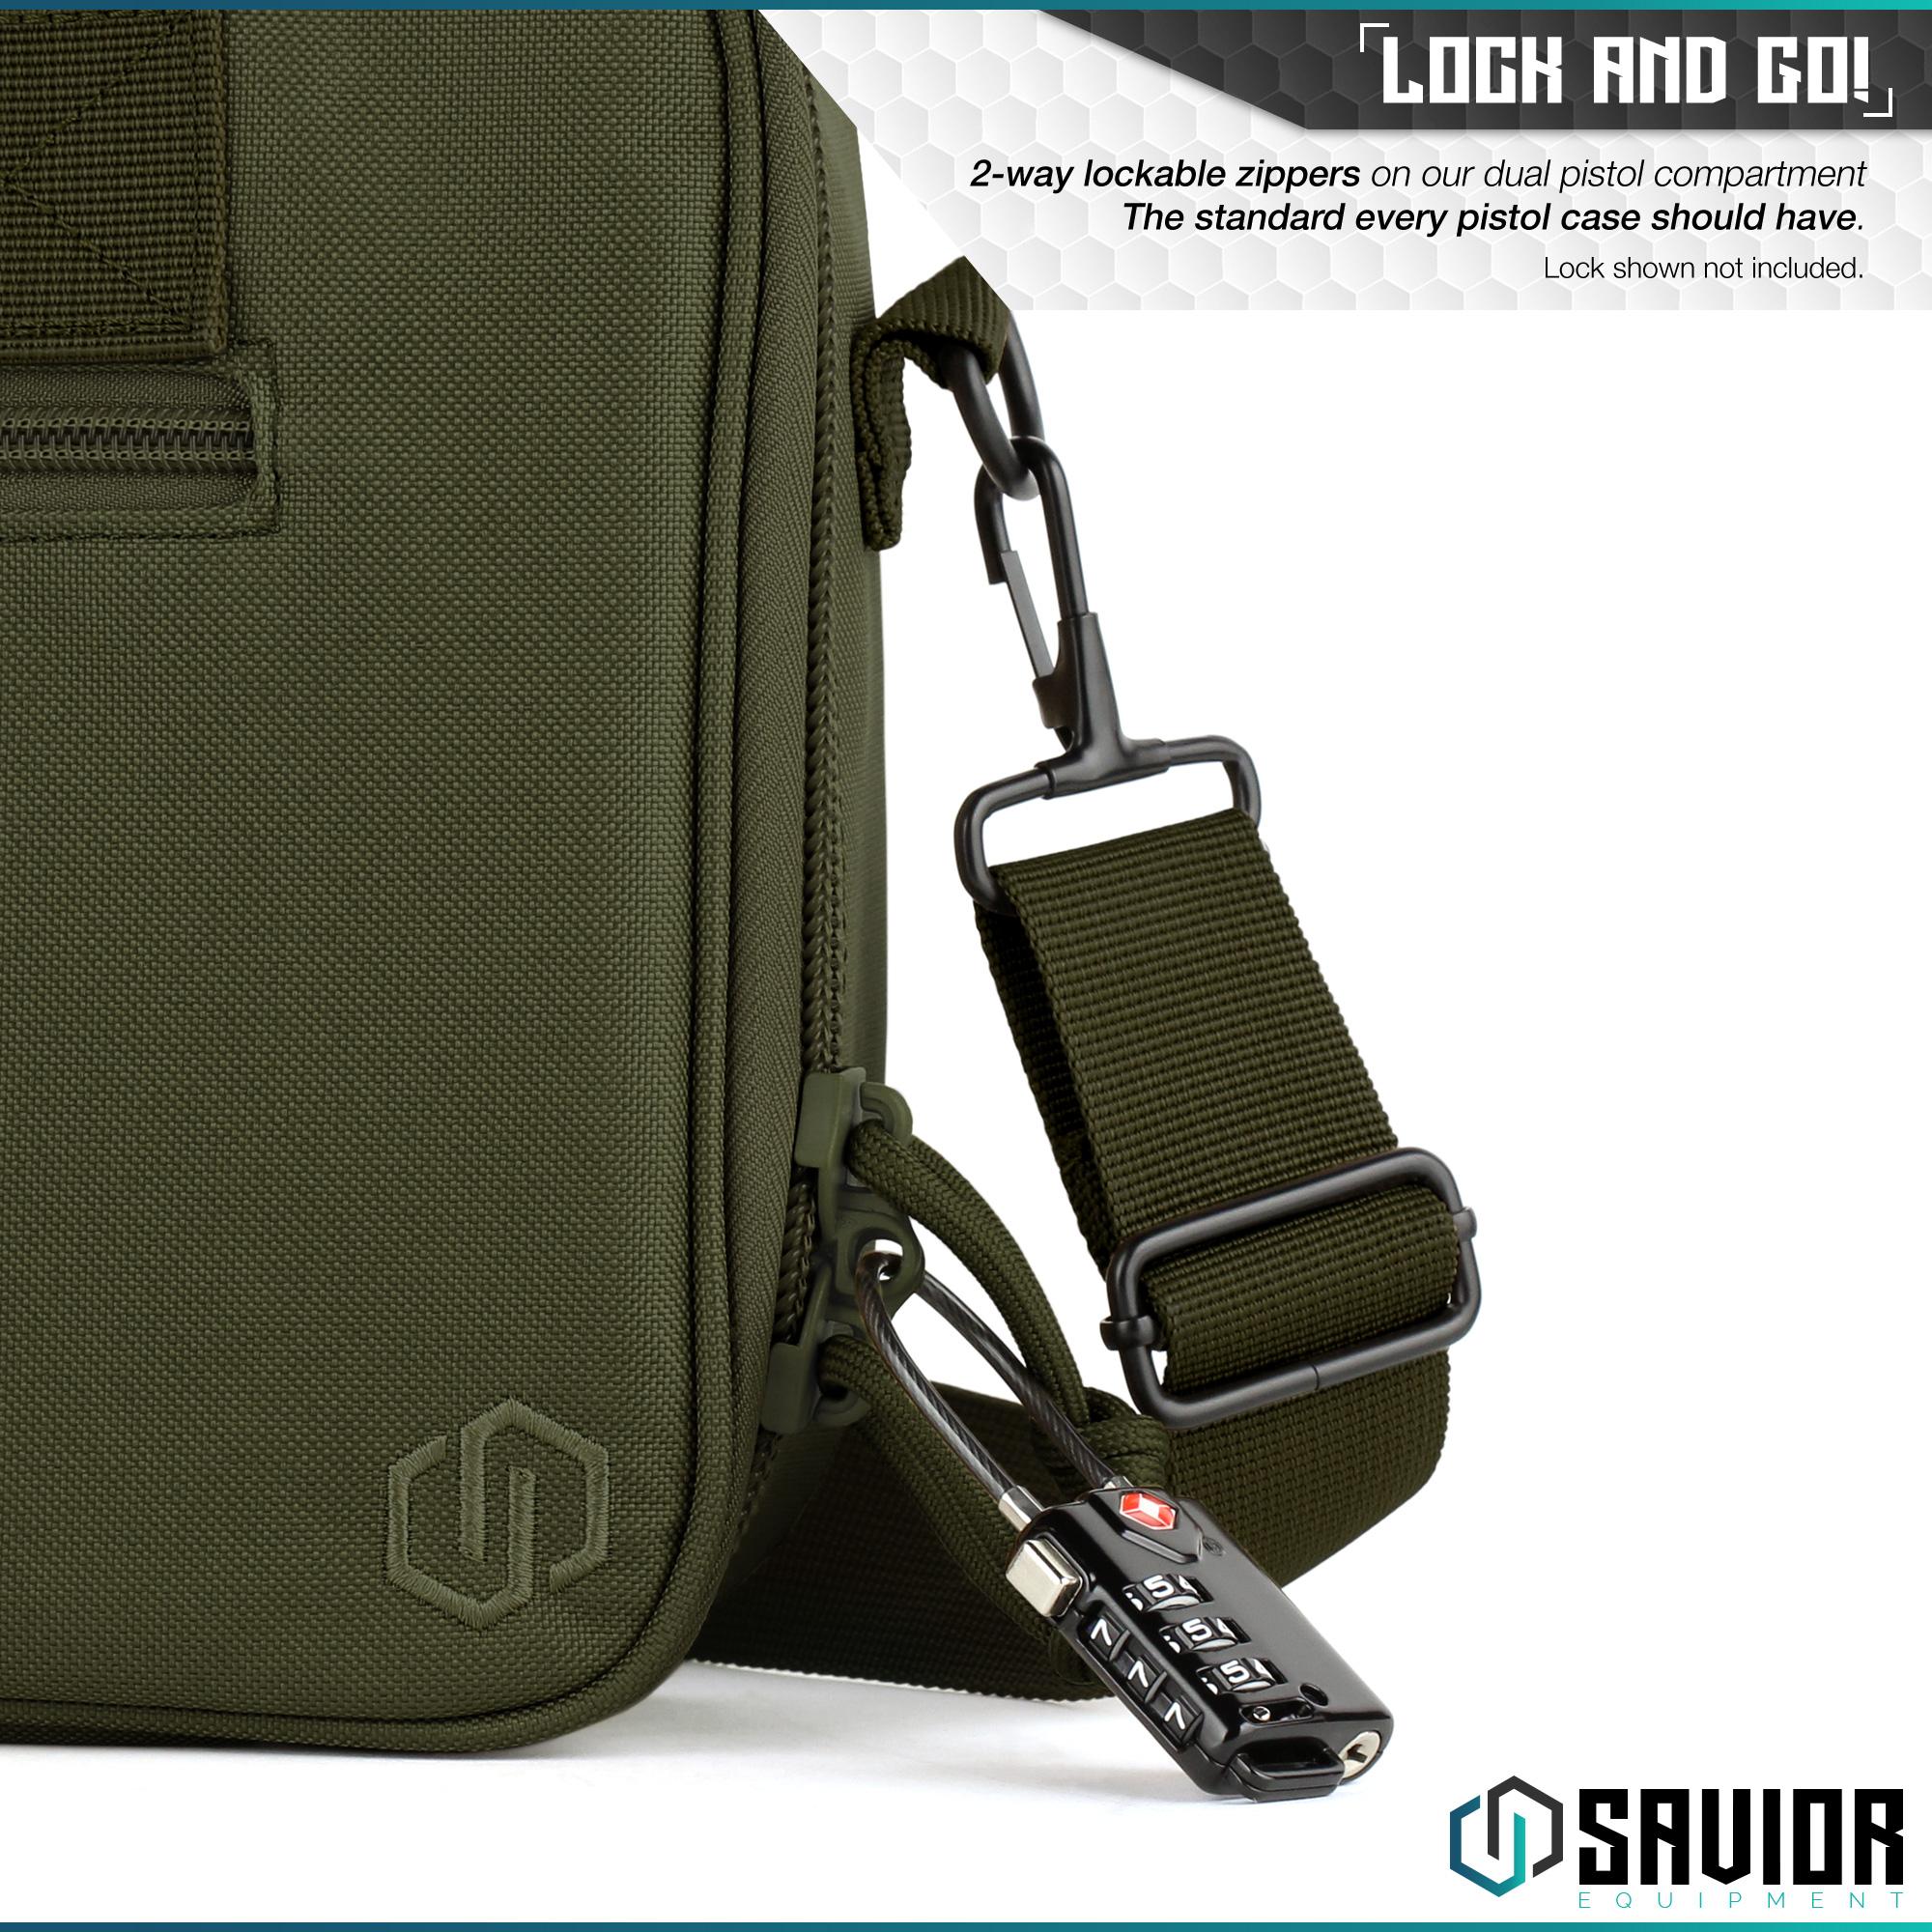 034-SAVIOR-034-Padded-Discreet-Double-Handgun-Bag-Pistol-Storage-Case-w-Mag-Pouch-Slot thumbnail 23